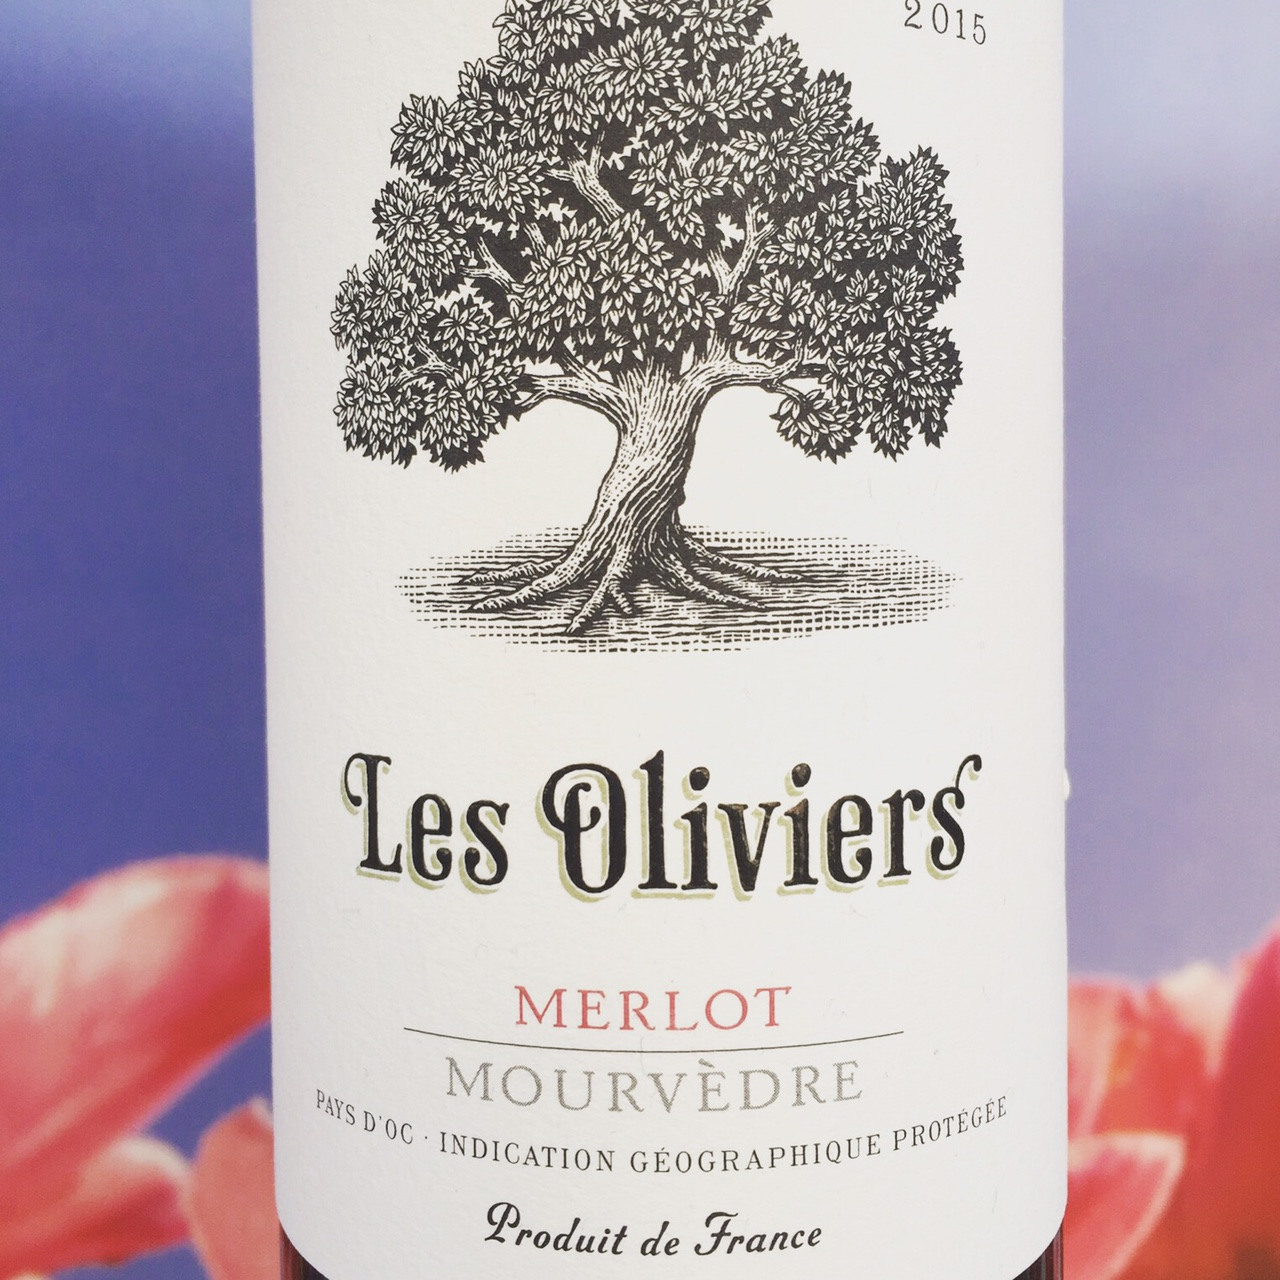 Les Oliviers, Merlot-Mourvedre